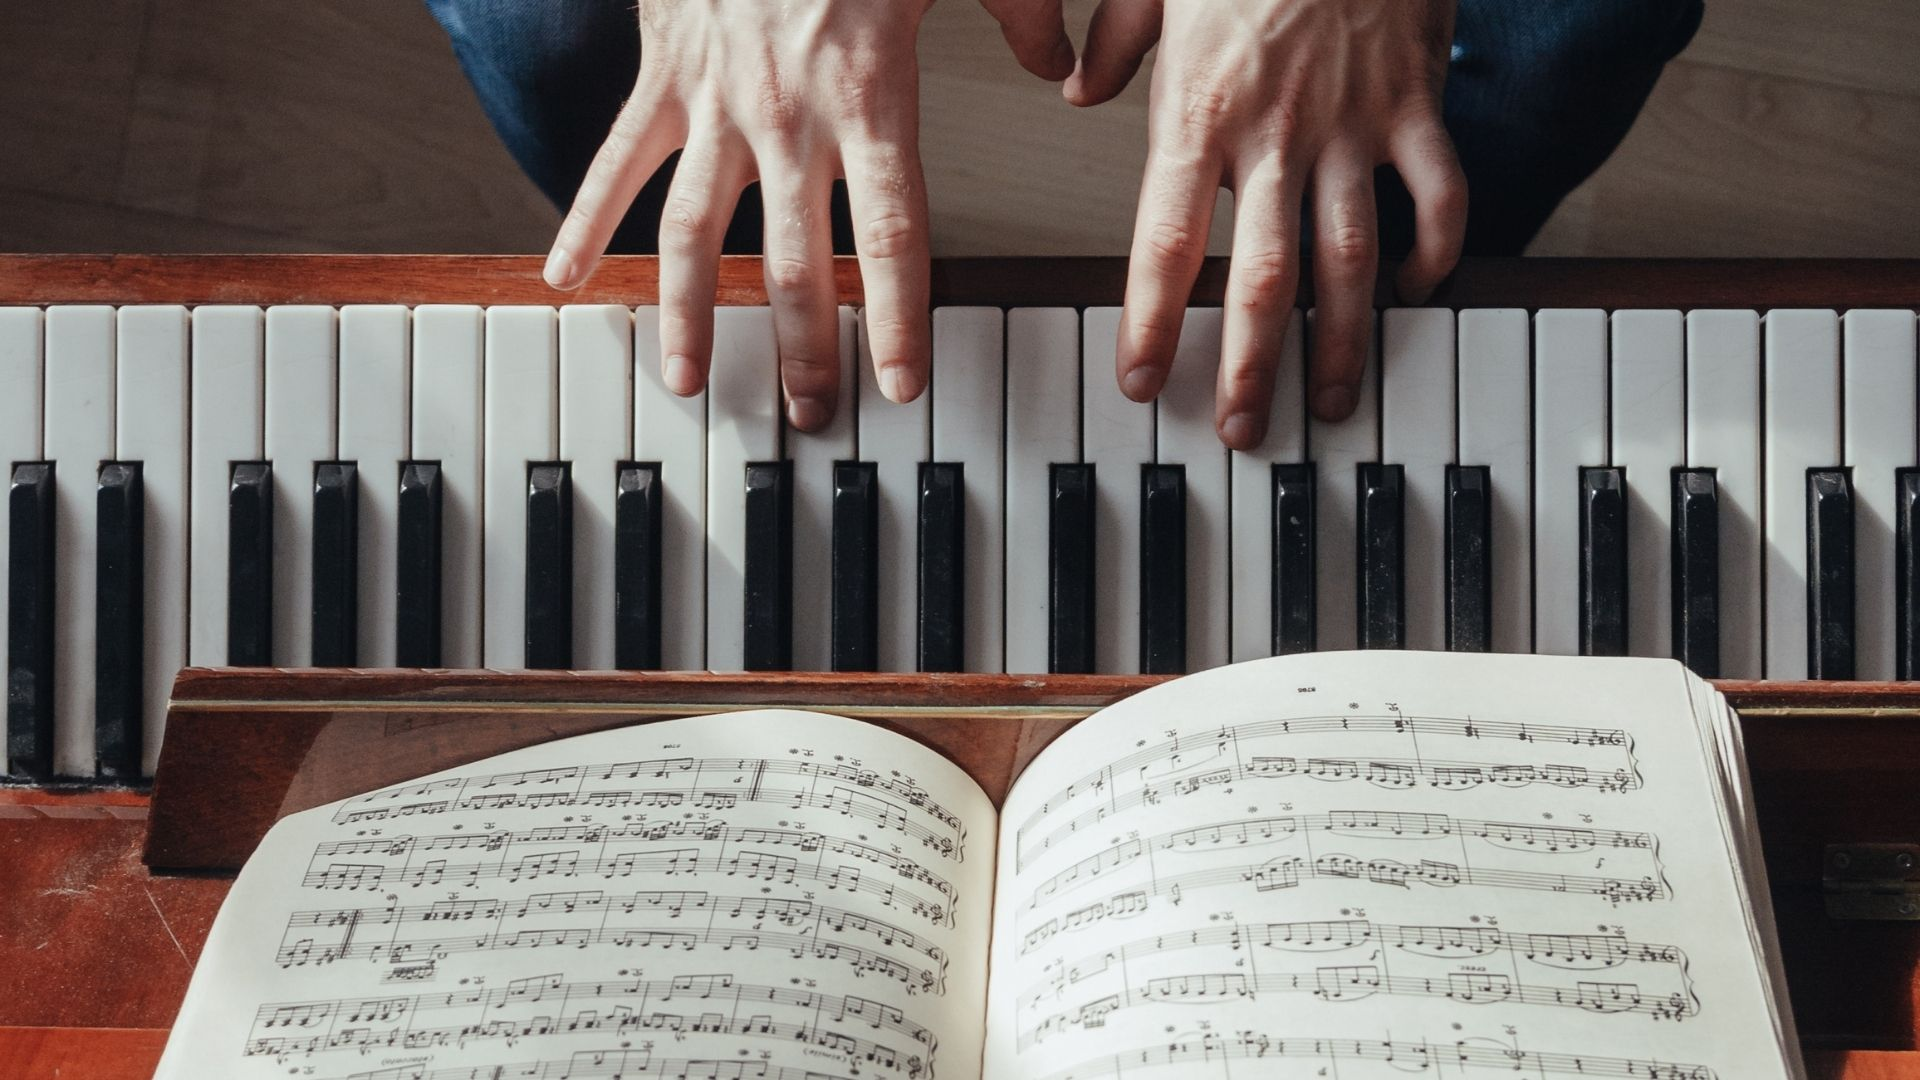 arte allegro - escuela de música - online - lenguaje musical